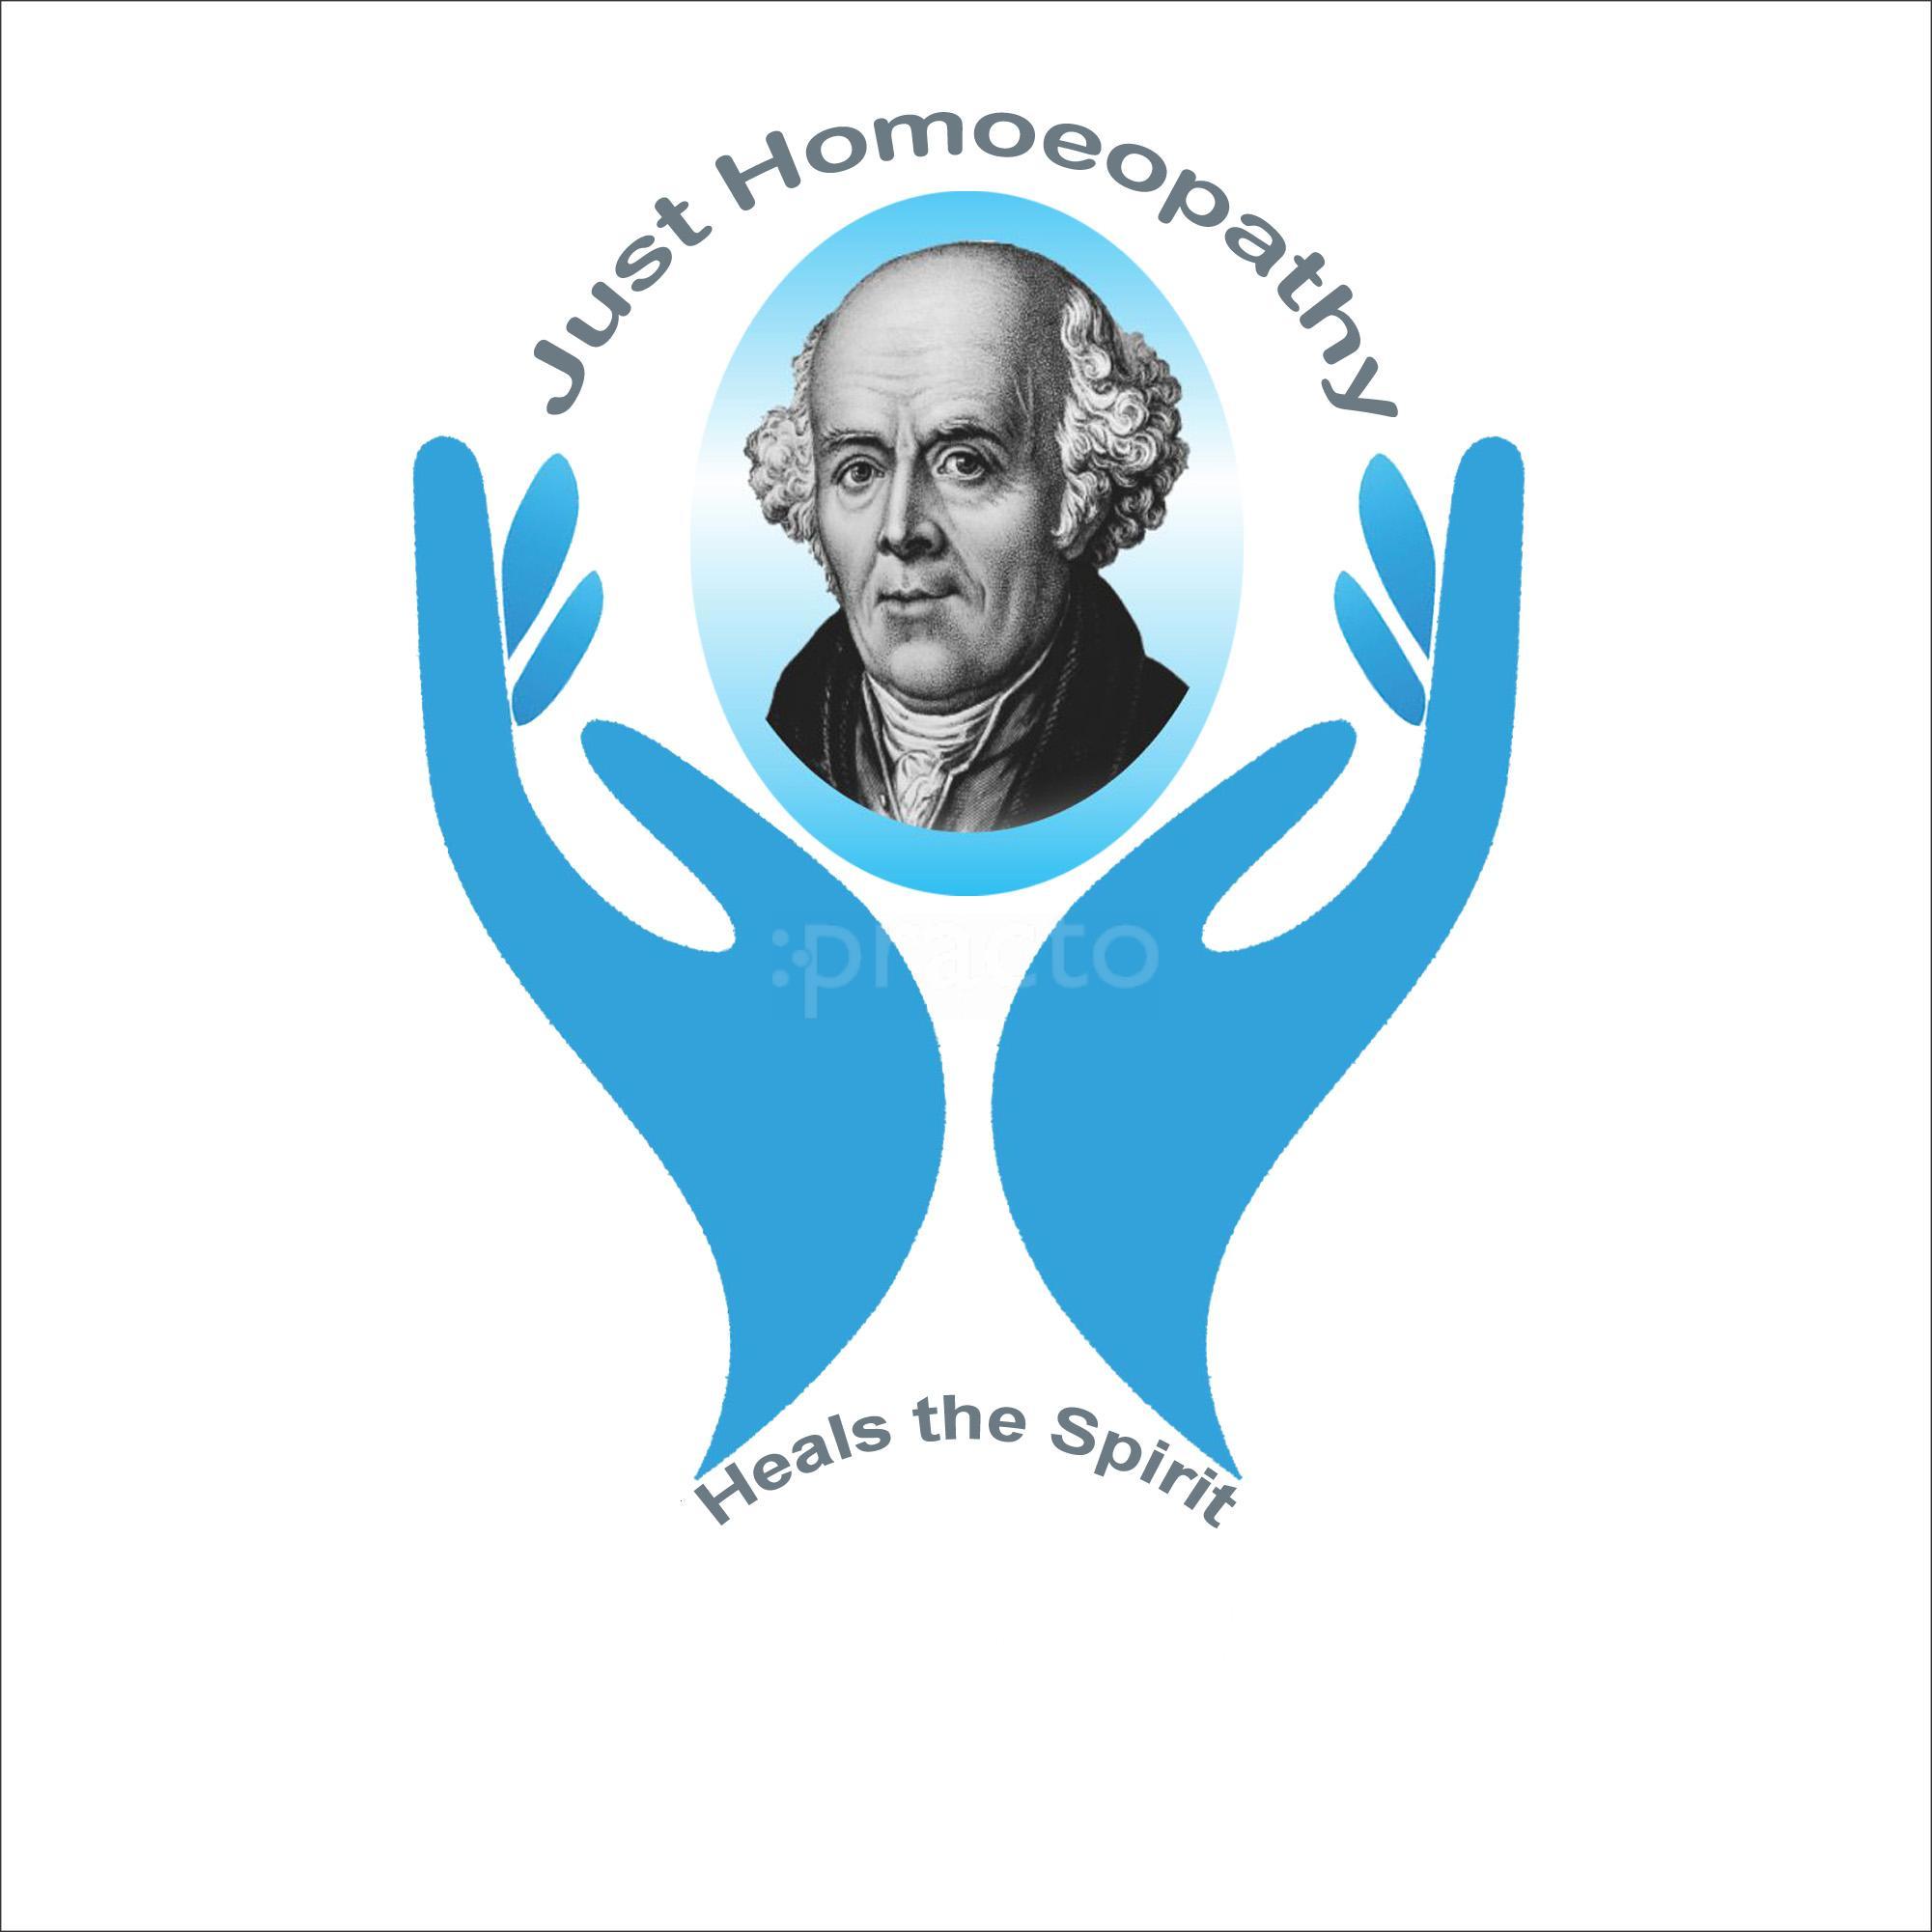 Just Homoeopathy